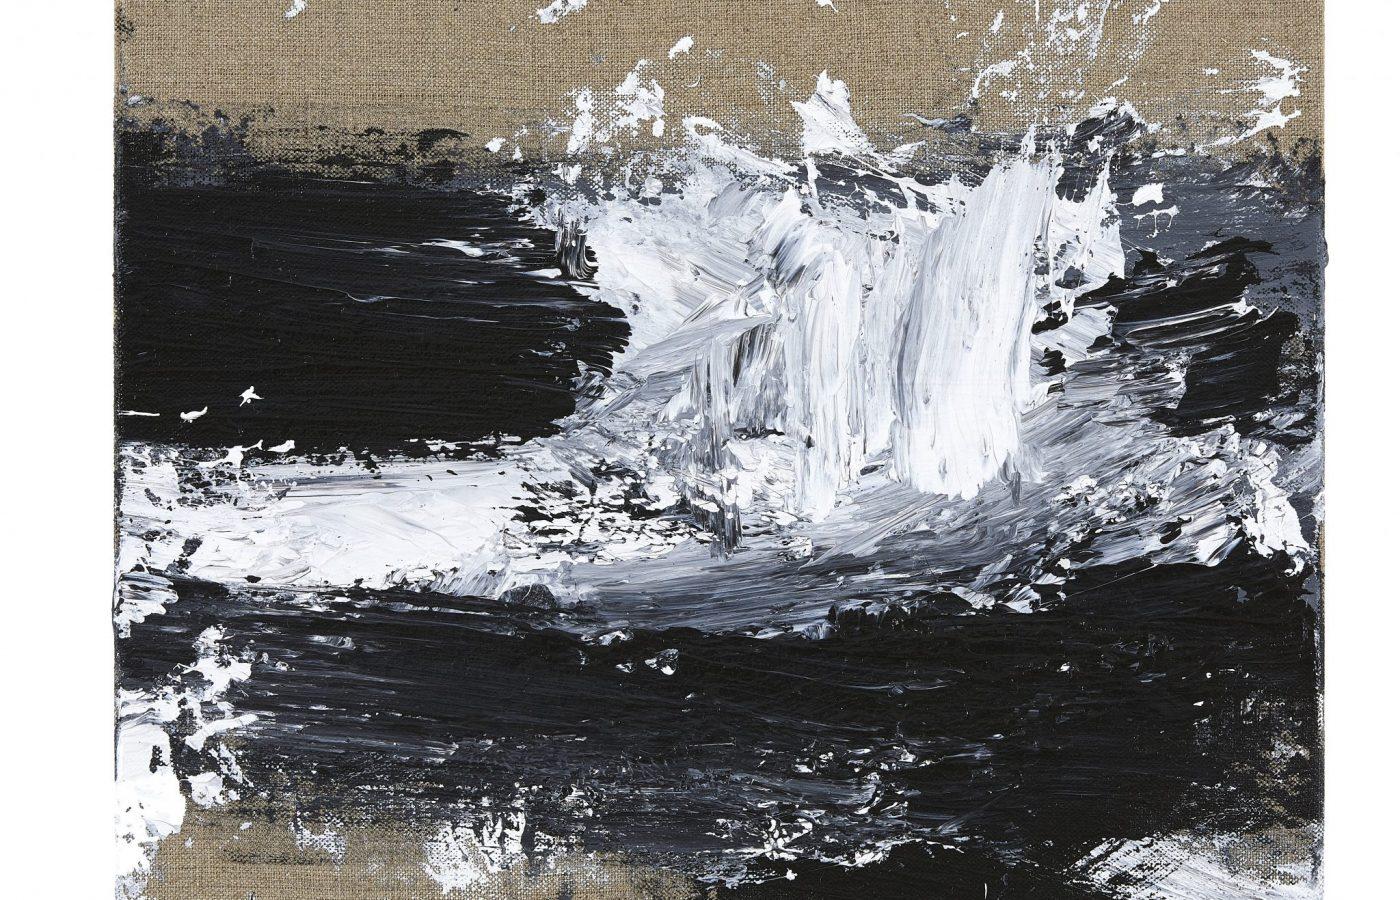 FXF18-48 John Virtue Untitled No 21 2017